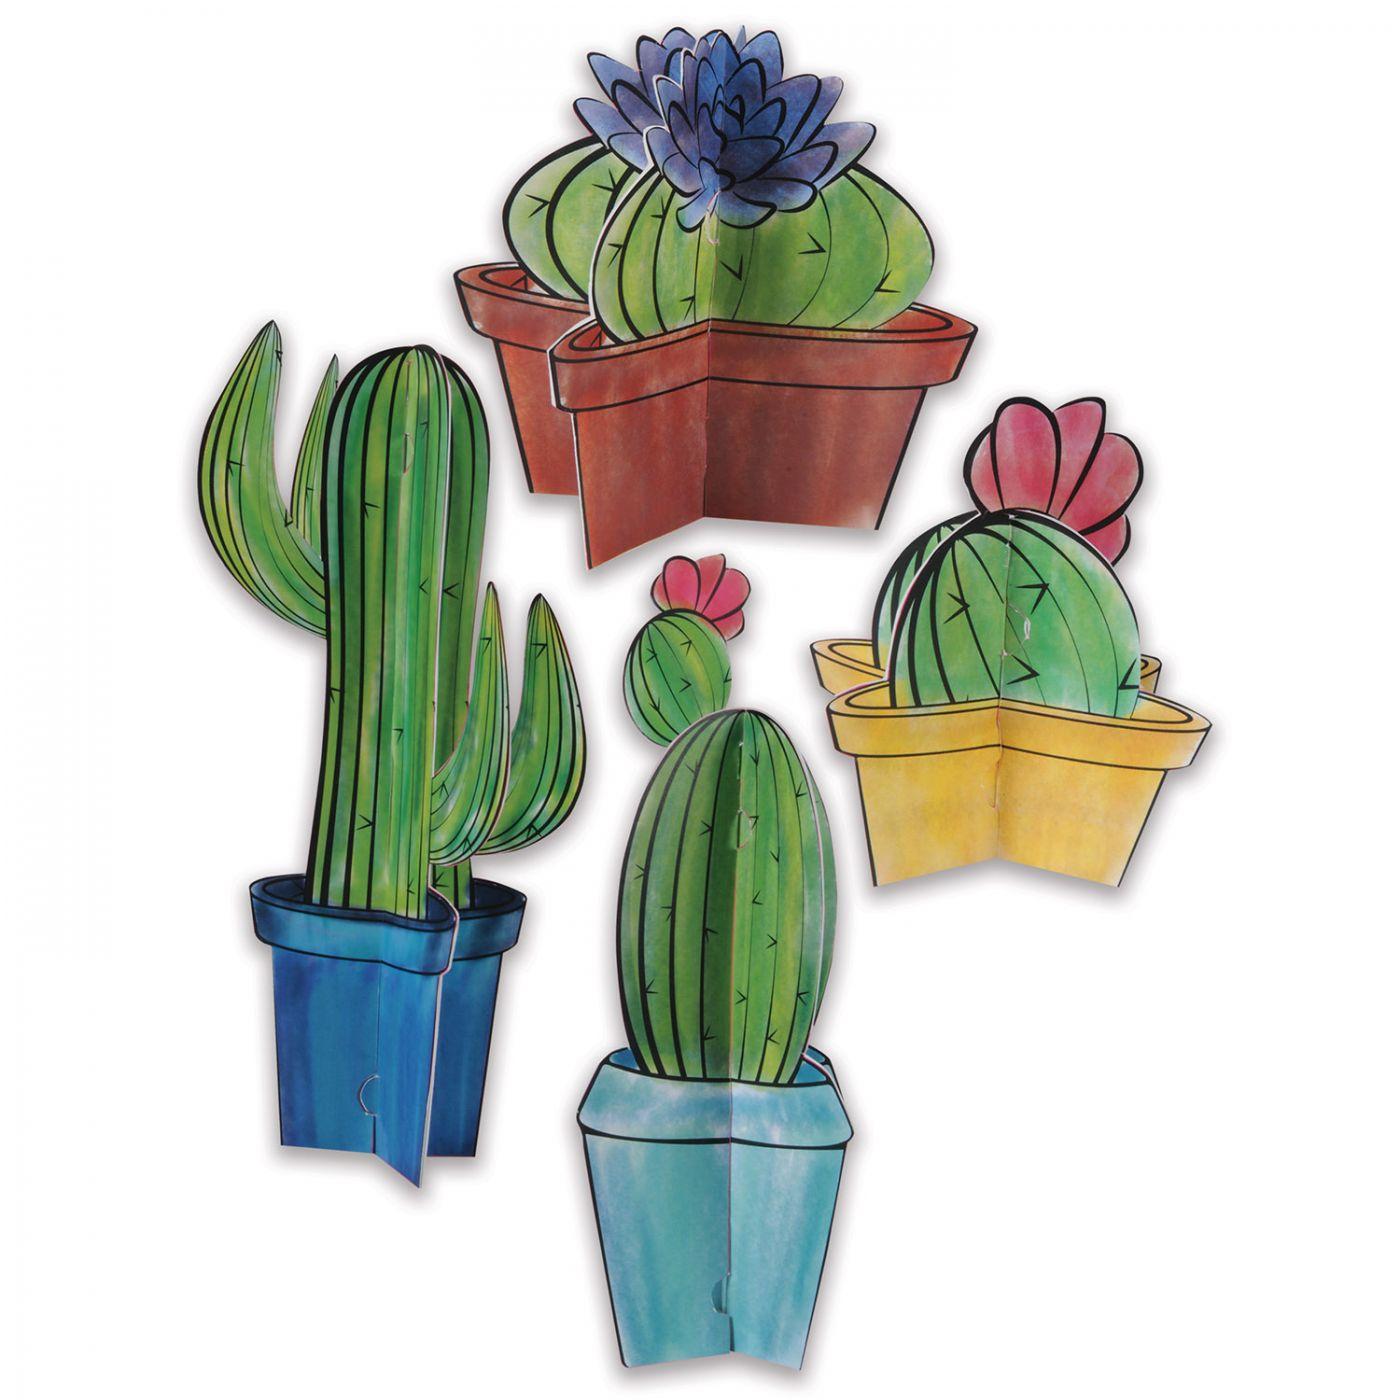 Image of 3-D Cactus Centerpieces